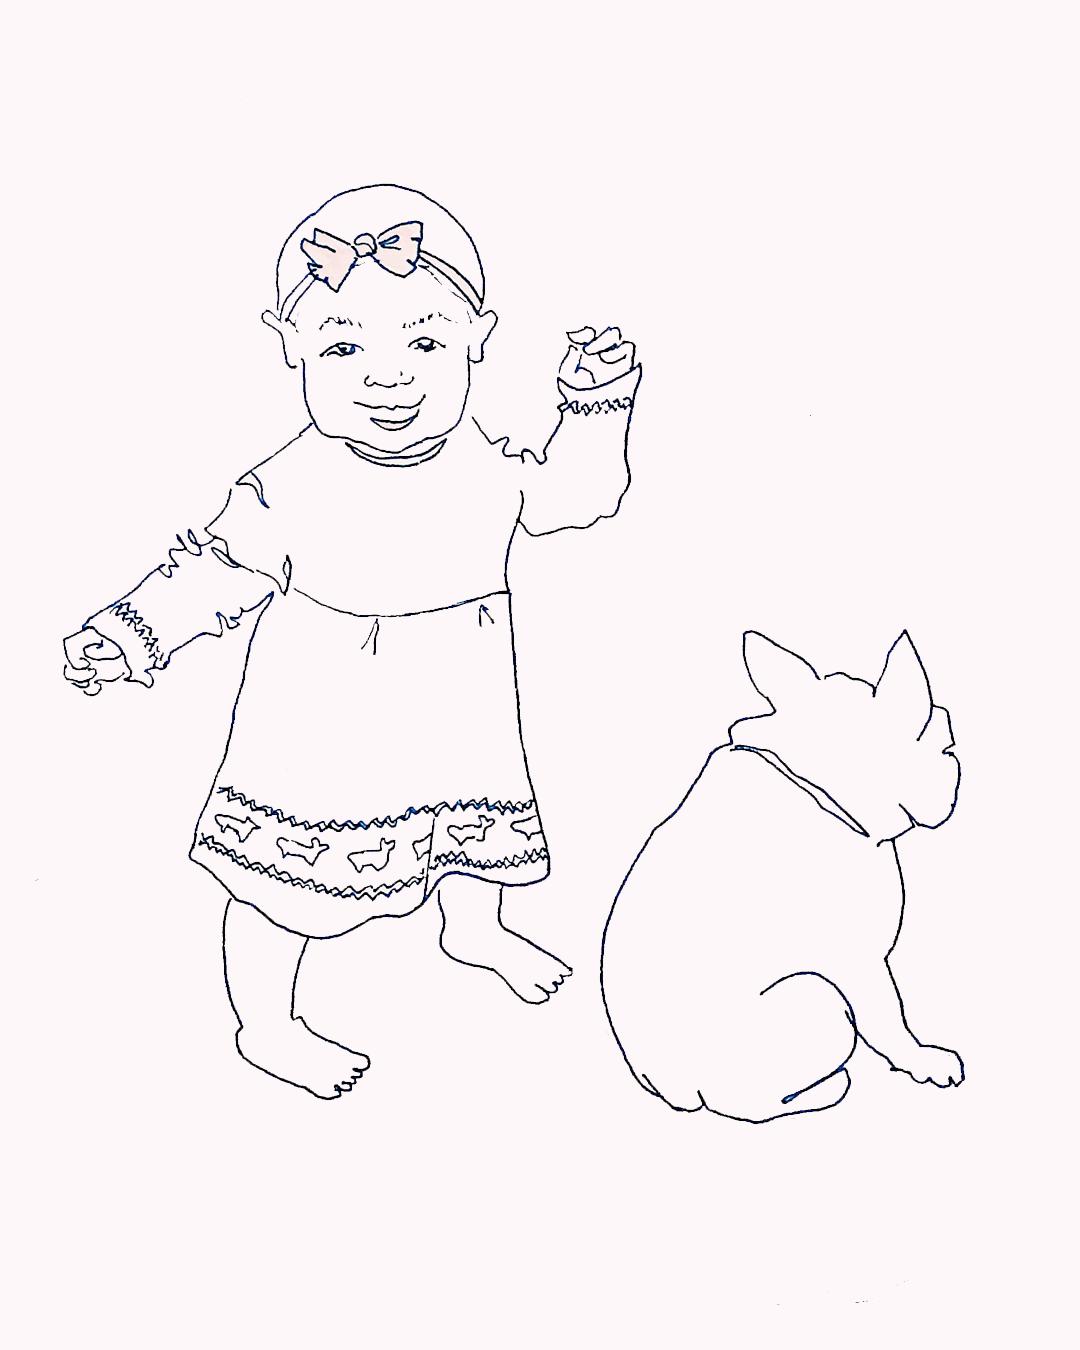 babyanddog.png